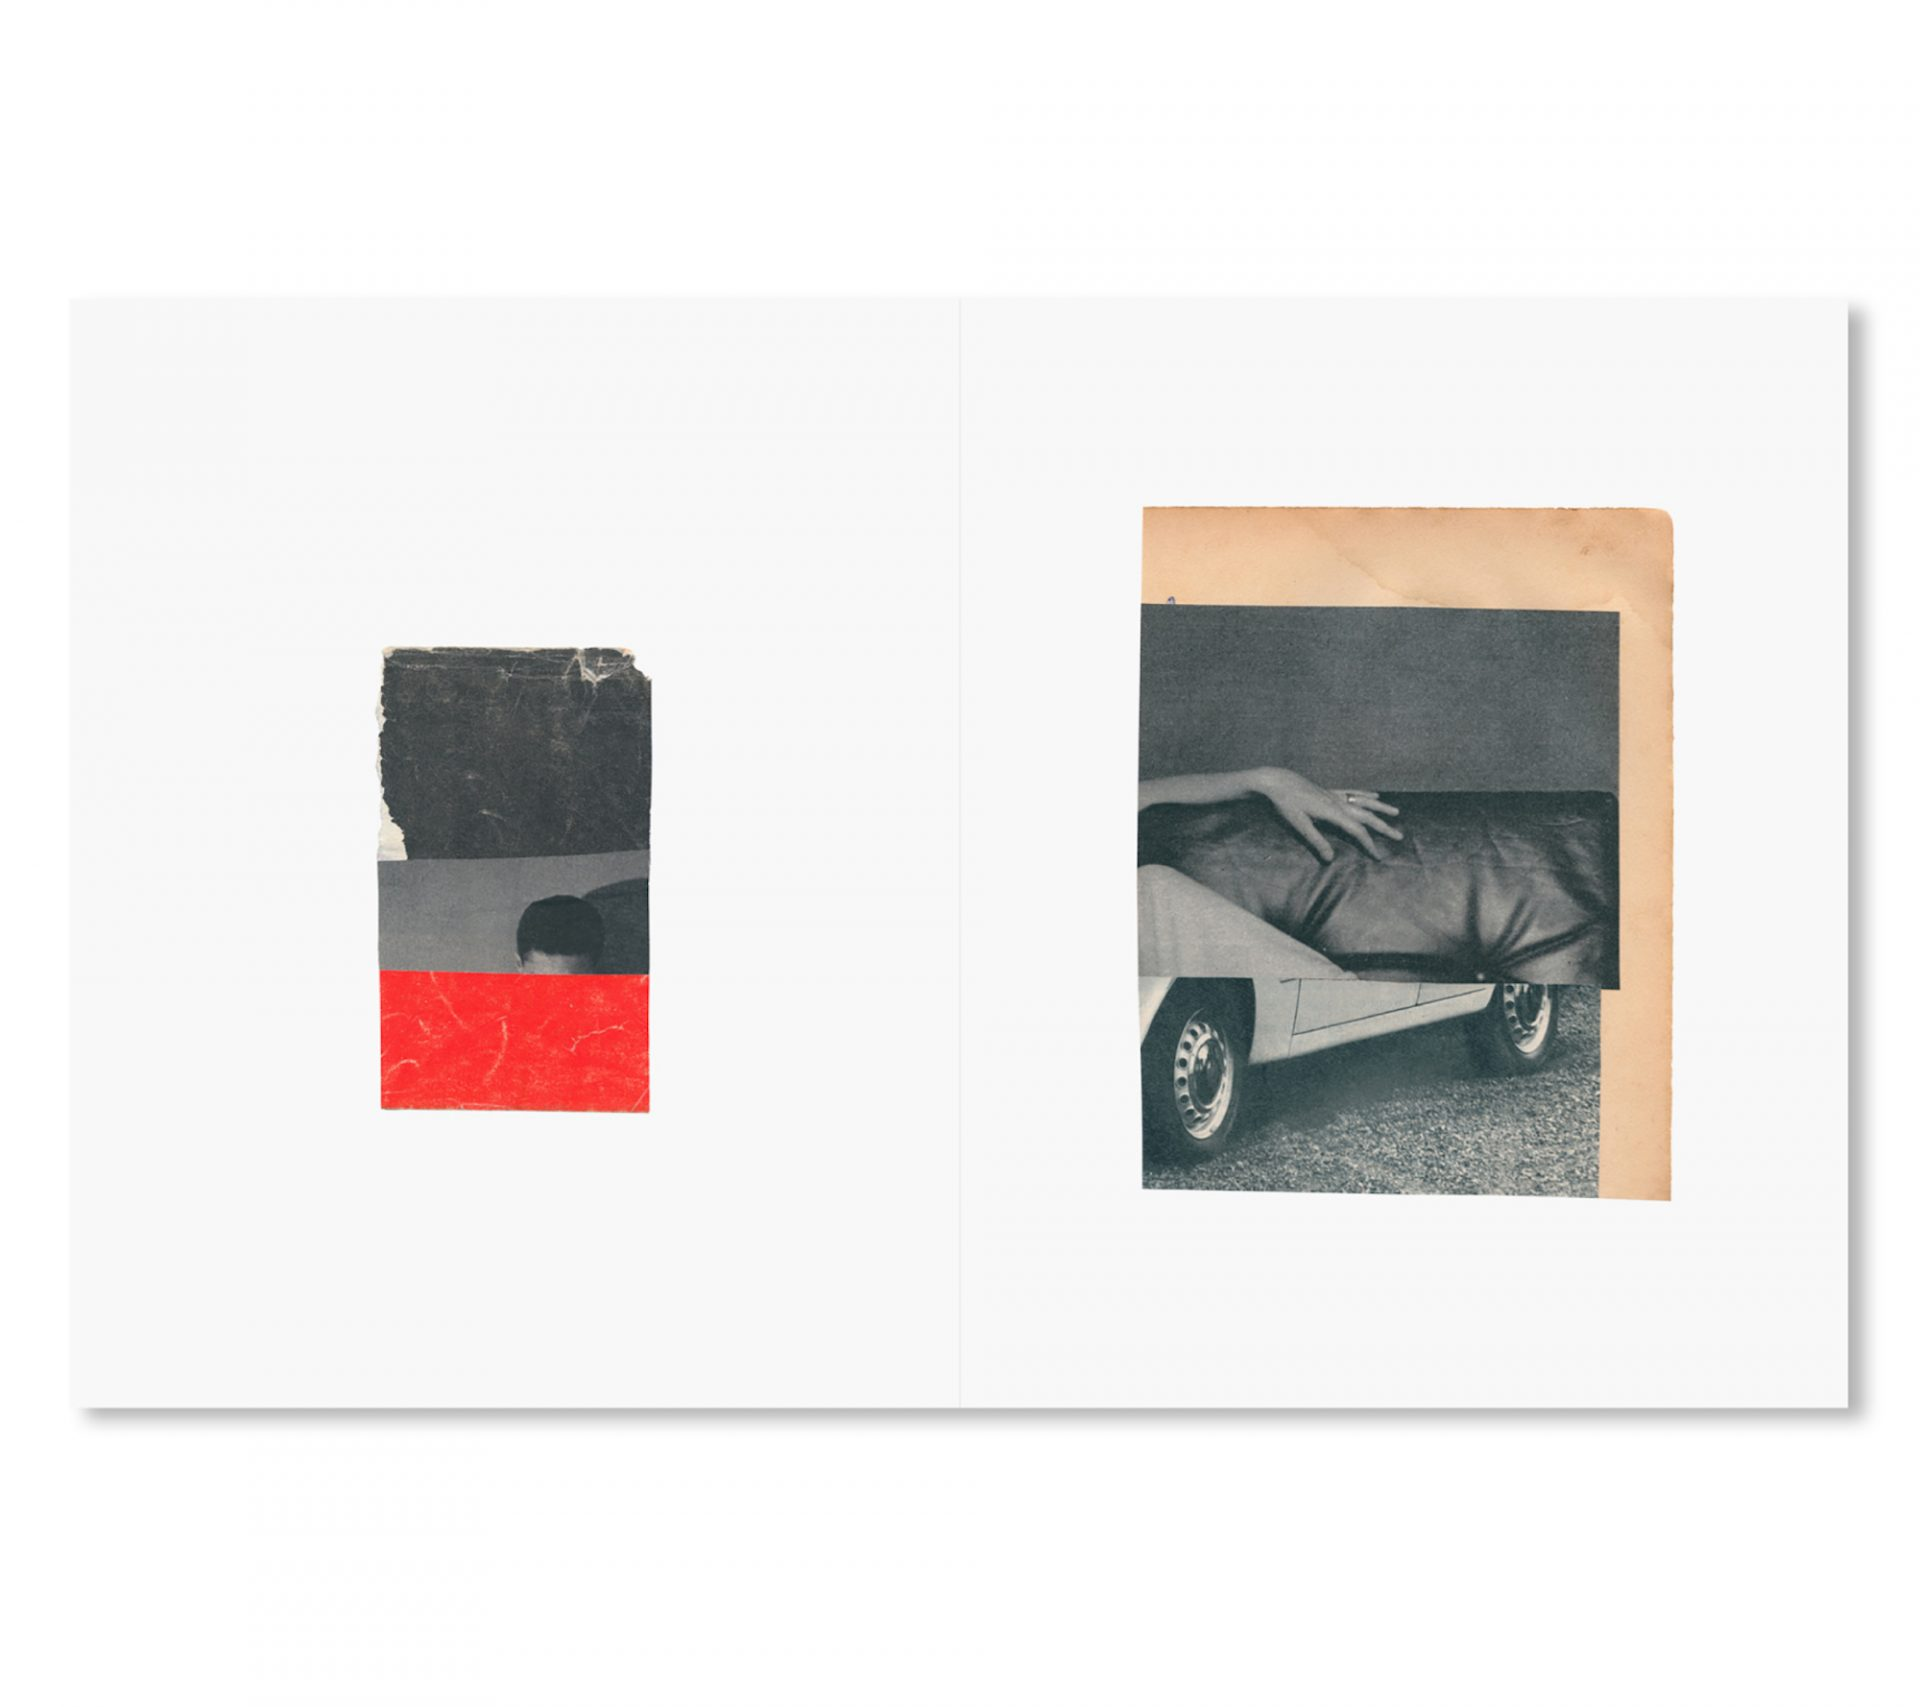 Katrien De Blauwer 「WHY I HATE CARS」